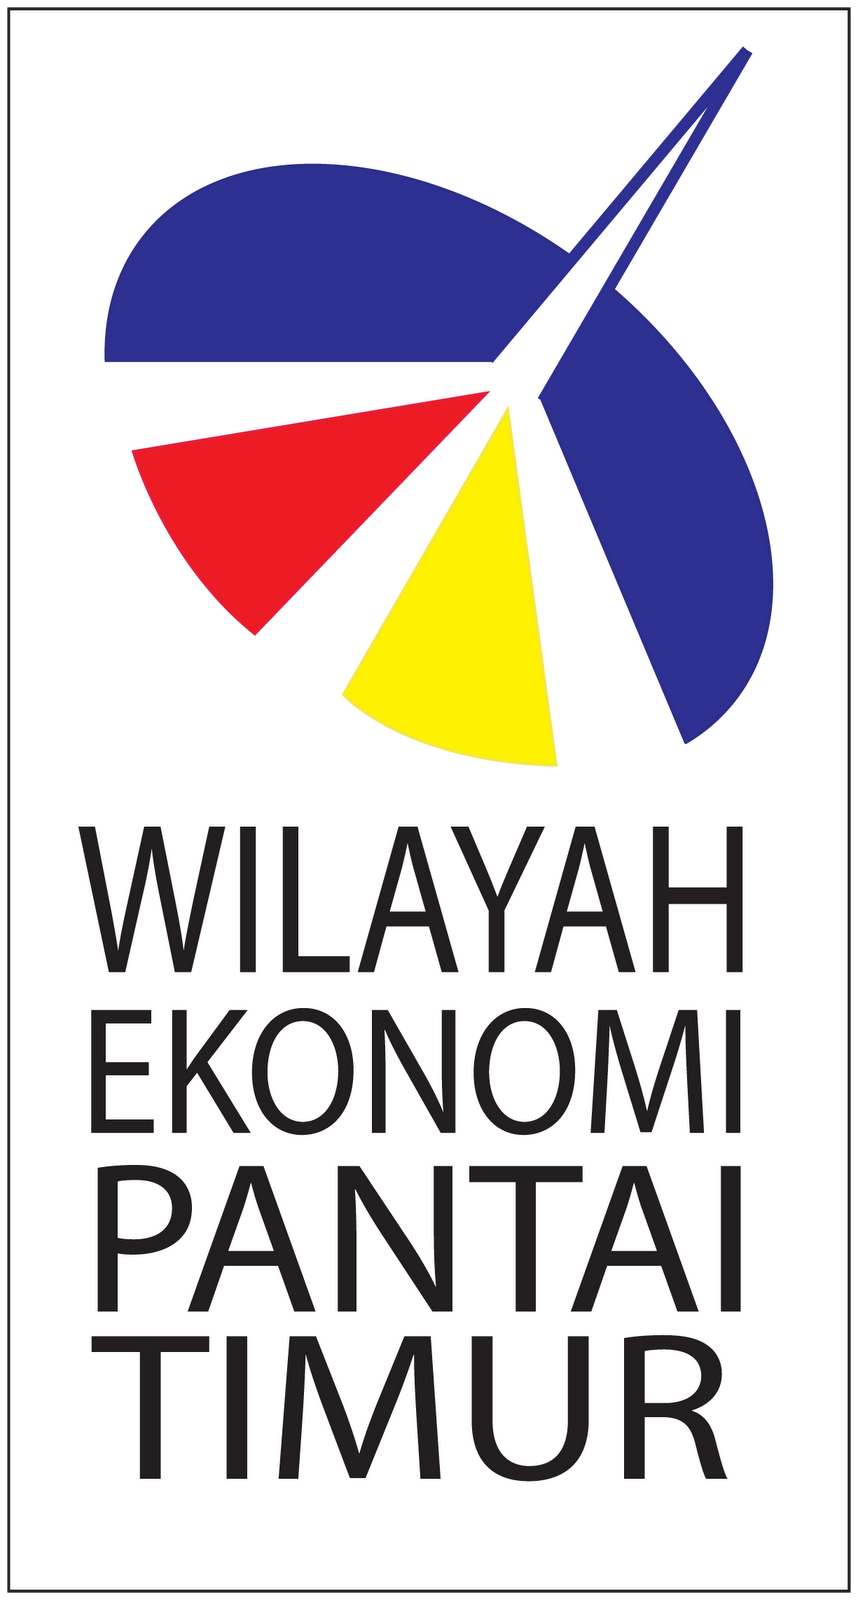 Wilayah Ekonomi Pantai Timur Ecer